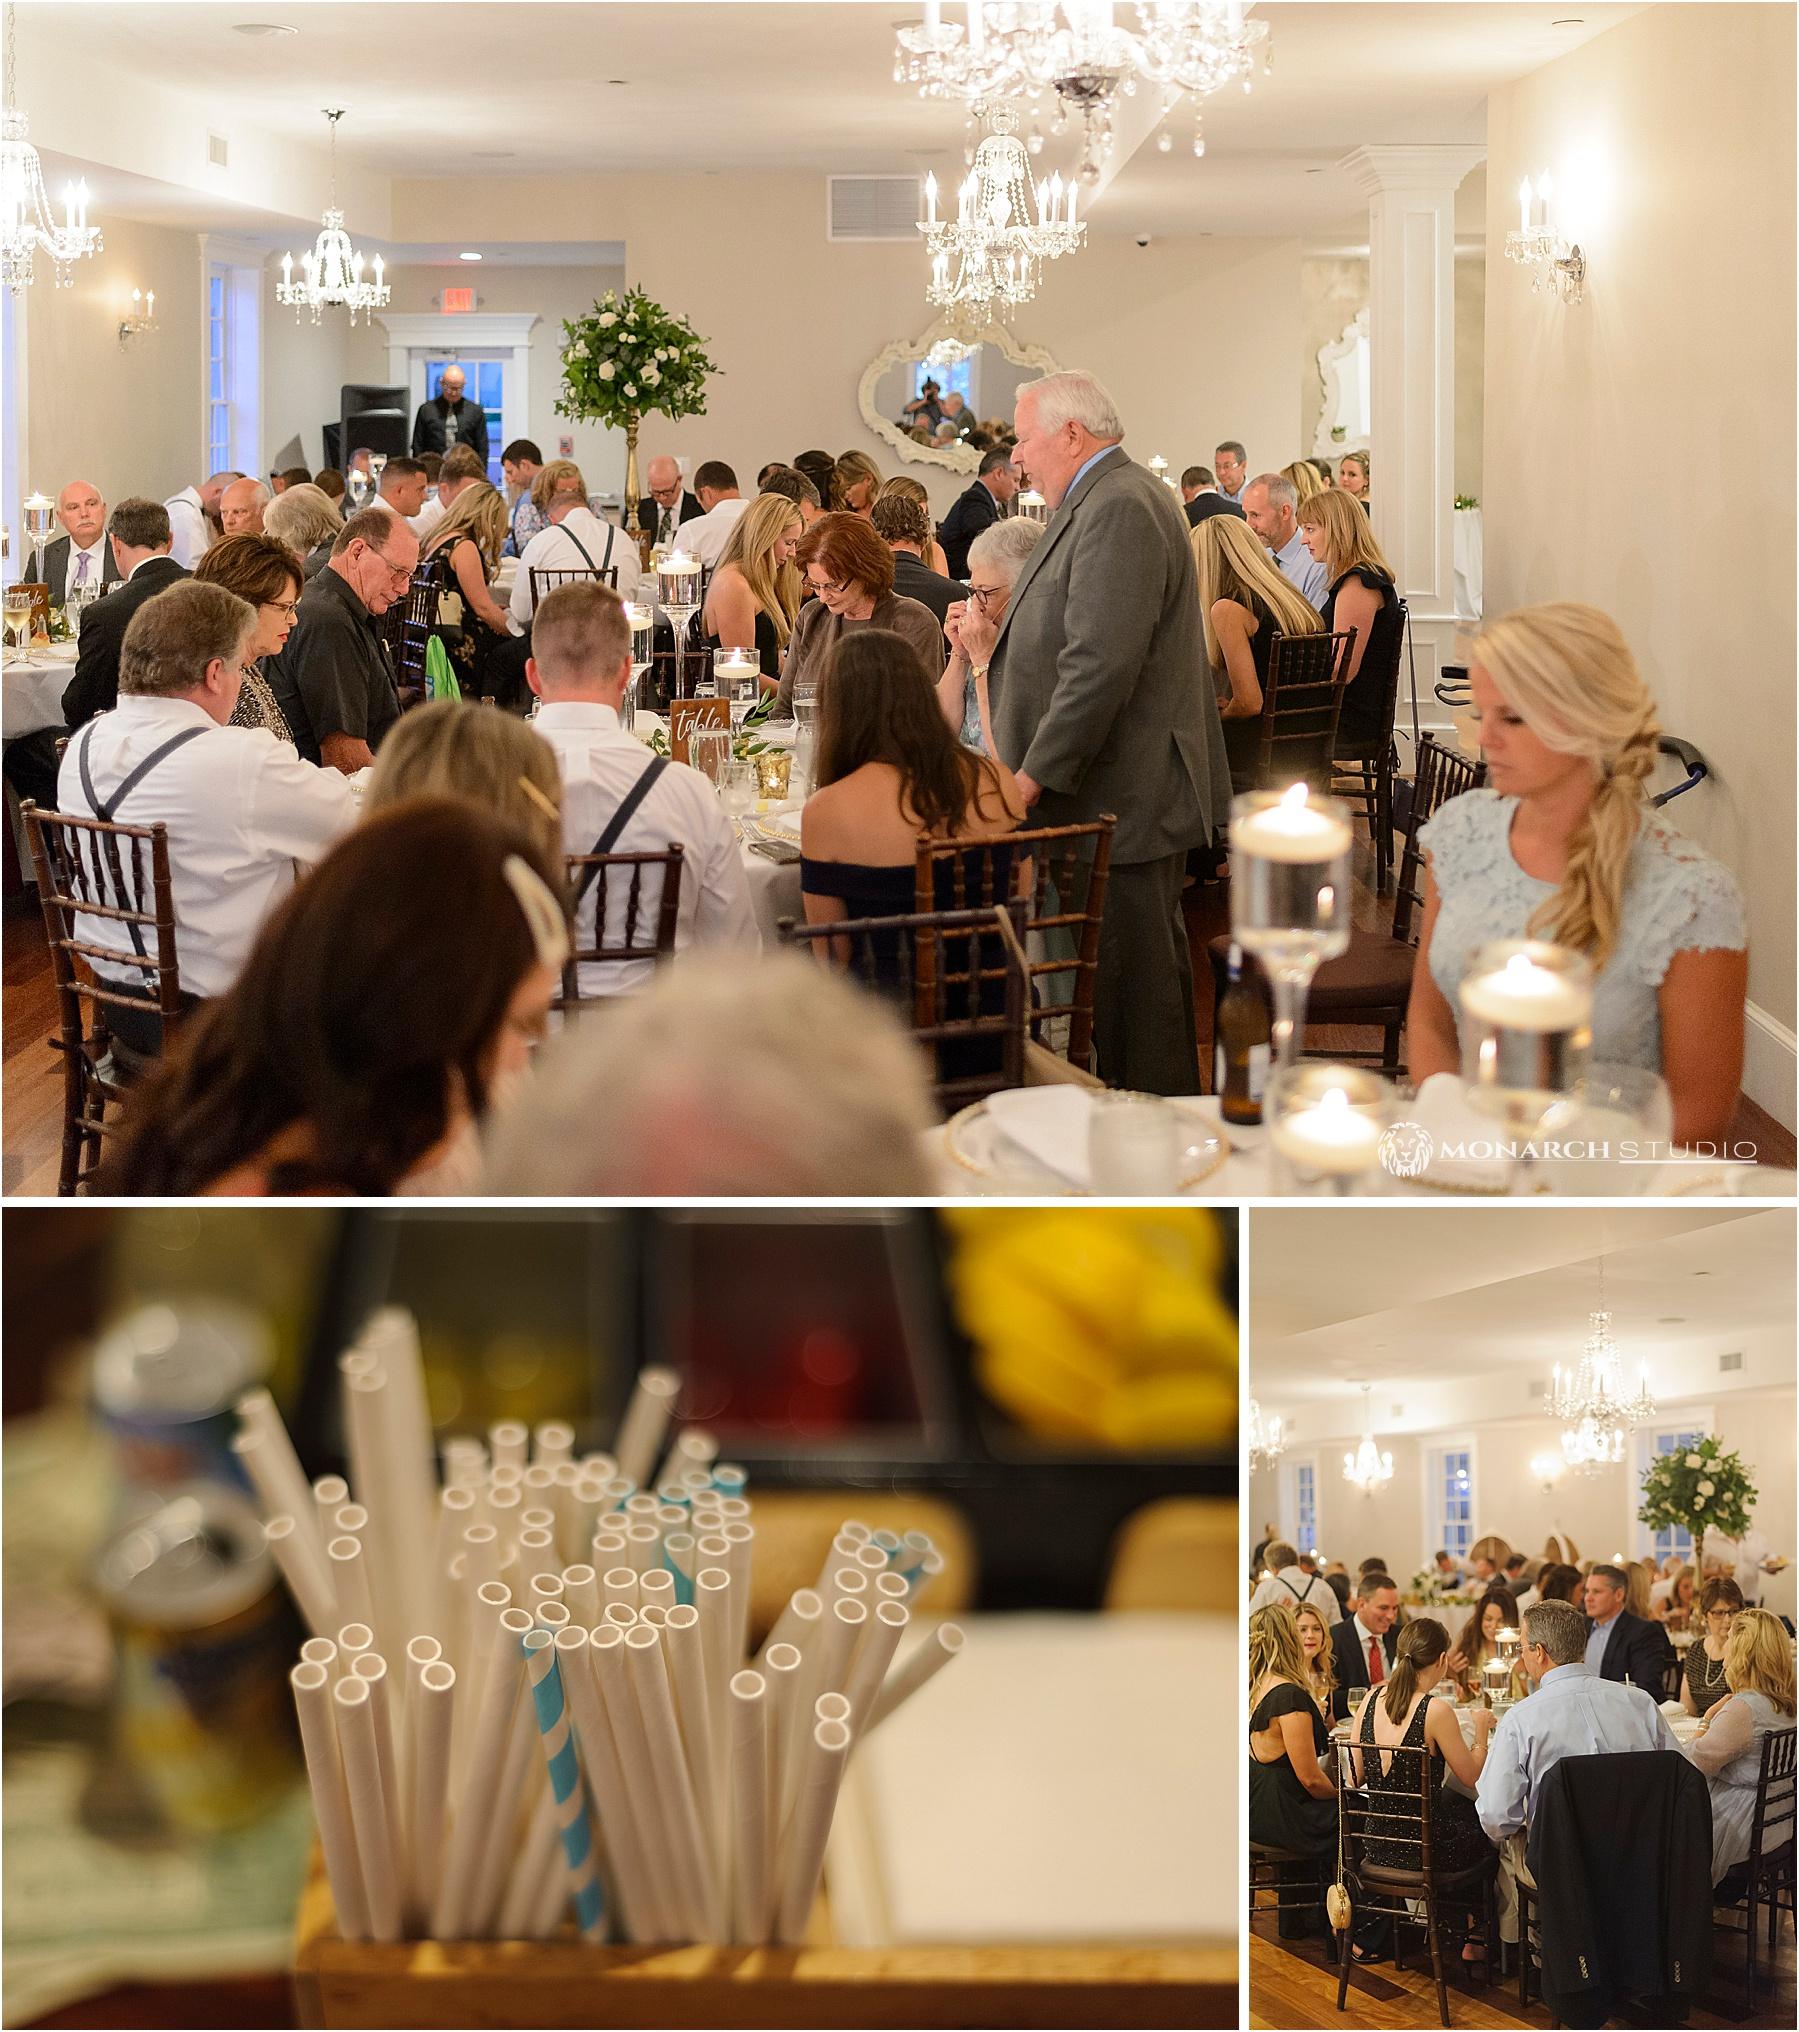 097-whiteroom-wedding-photographer-2019-05-22_0079.jpg